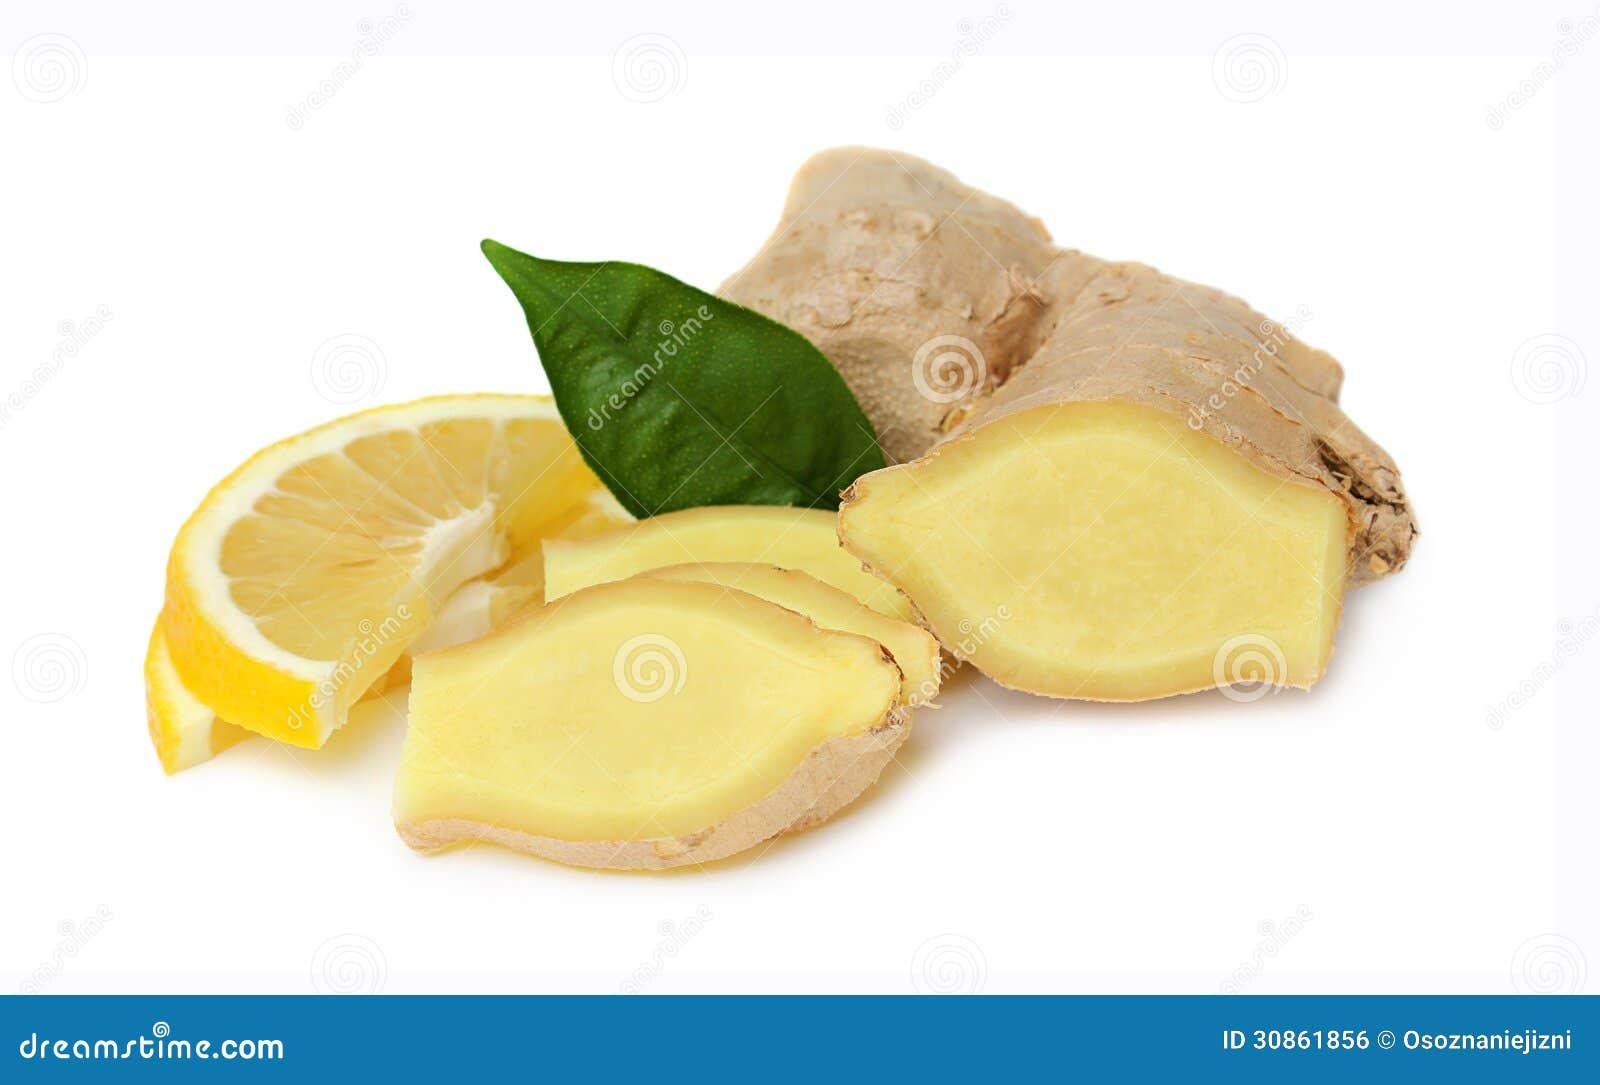 Sliced Ginger With Lemon Royalty Free Stock Image Image